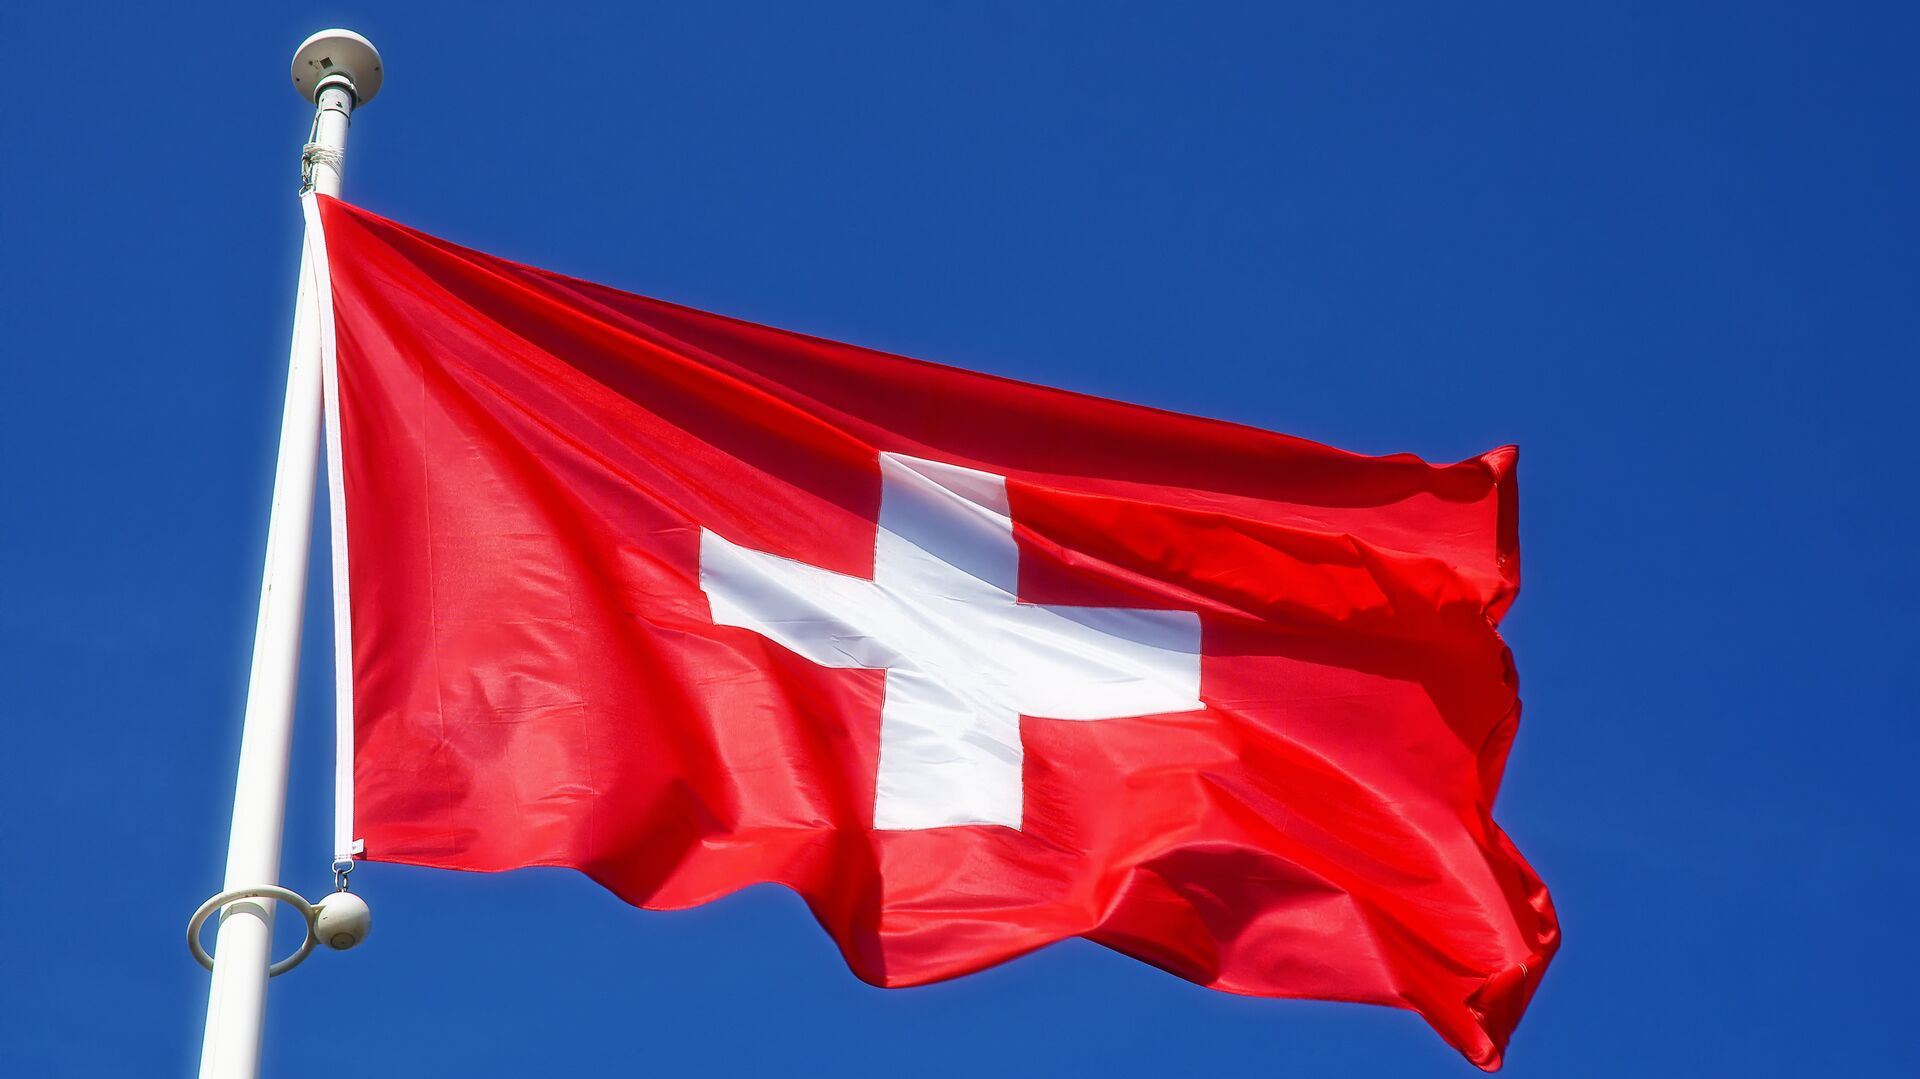 Флаг Швейцарии - РИА Новости, 1920, 07.07.2021